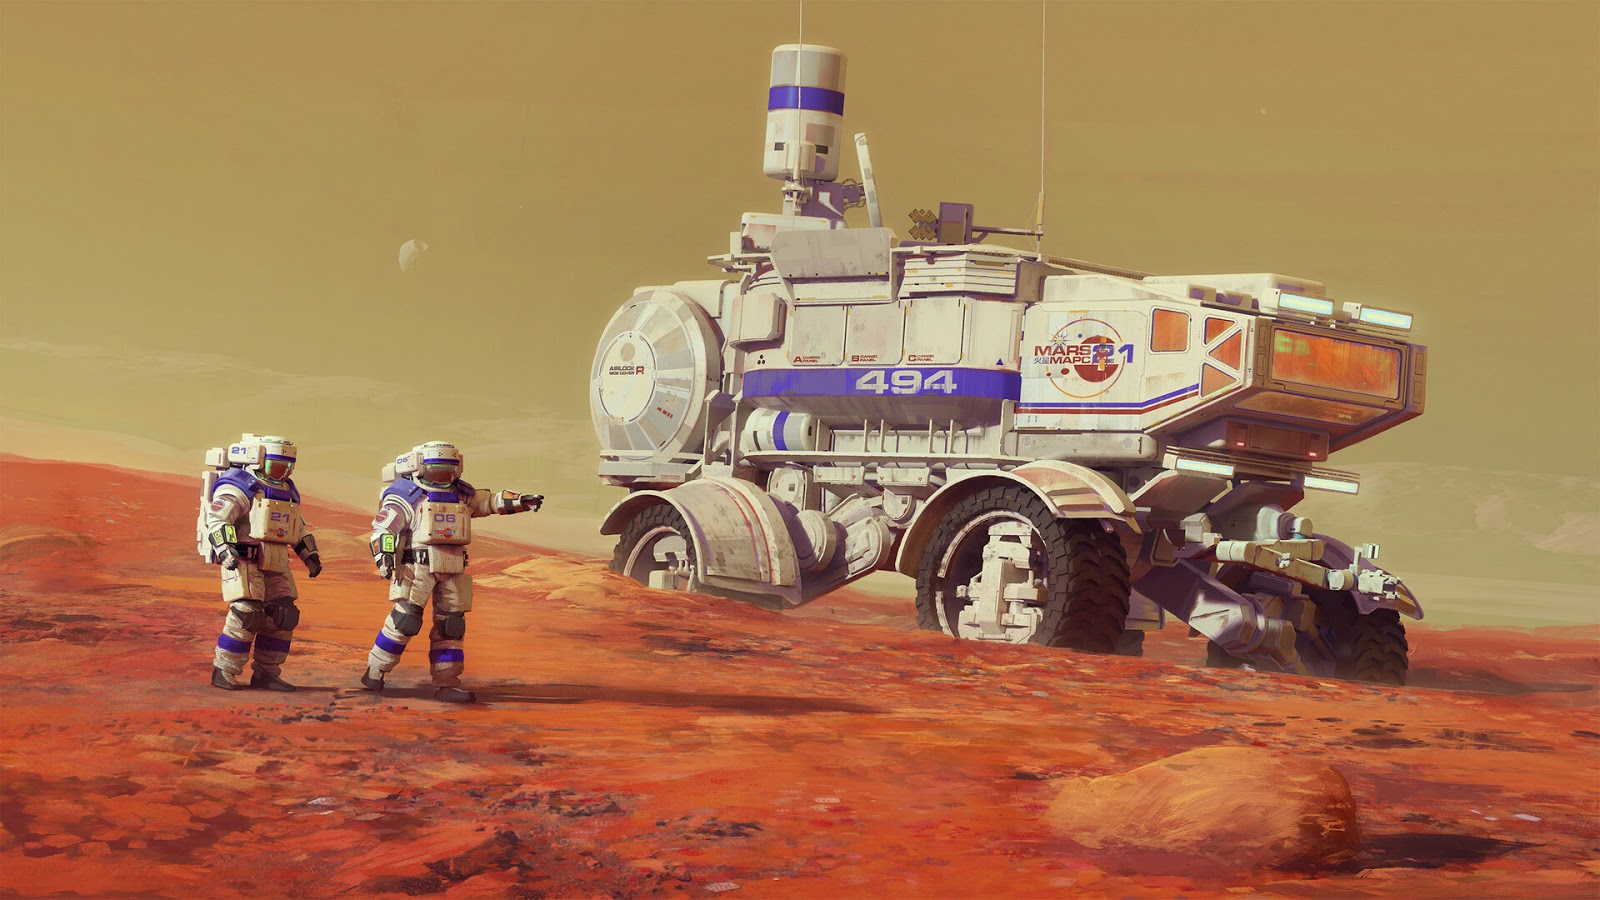 Illustration of mars exploration